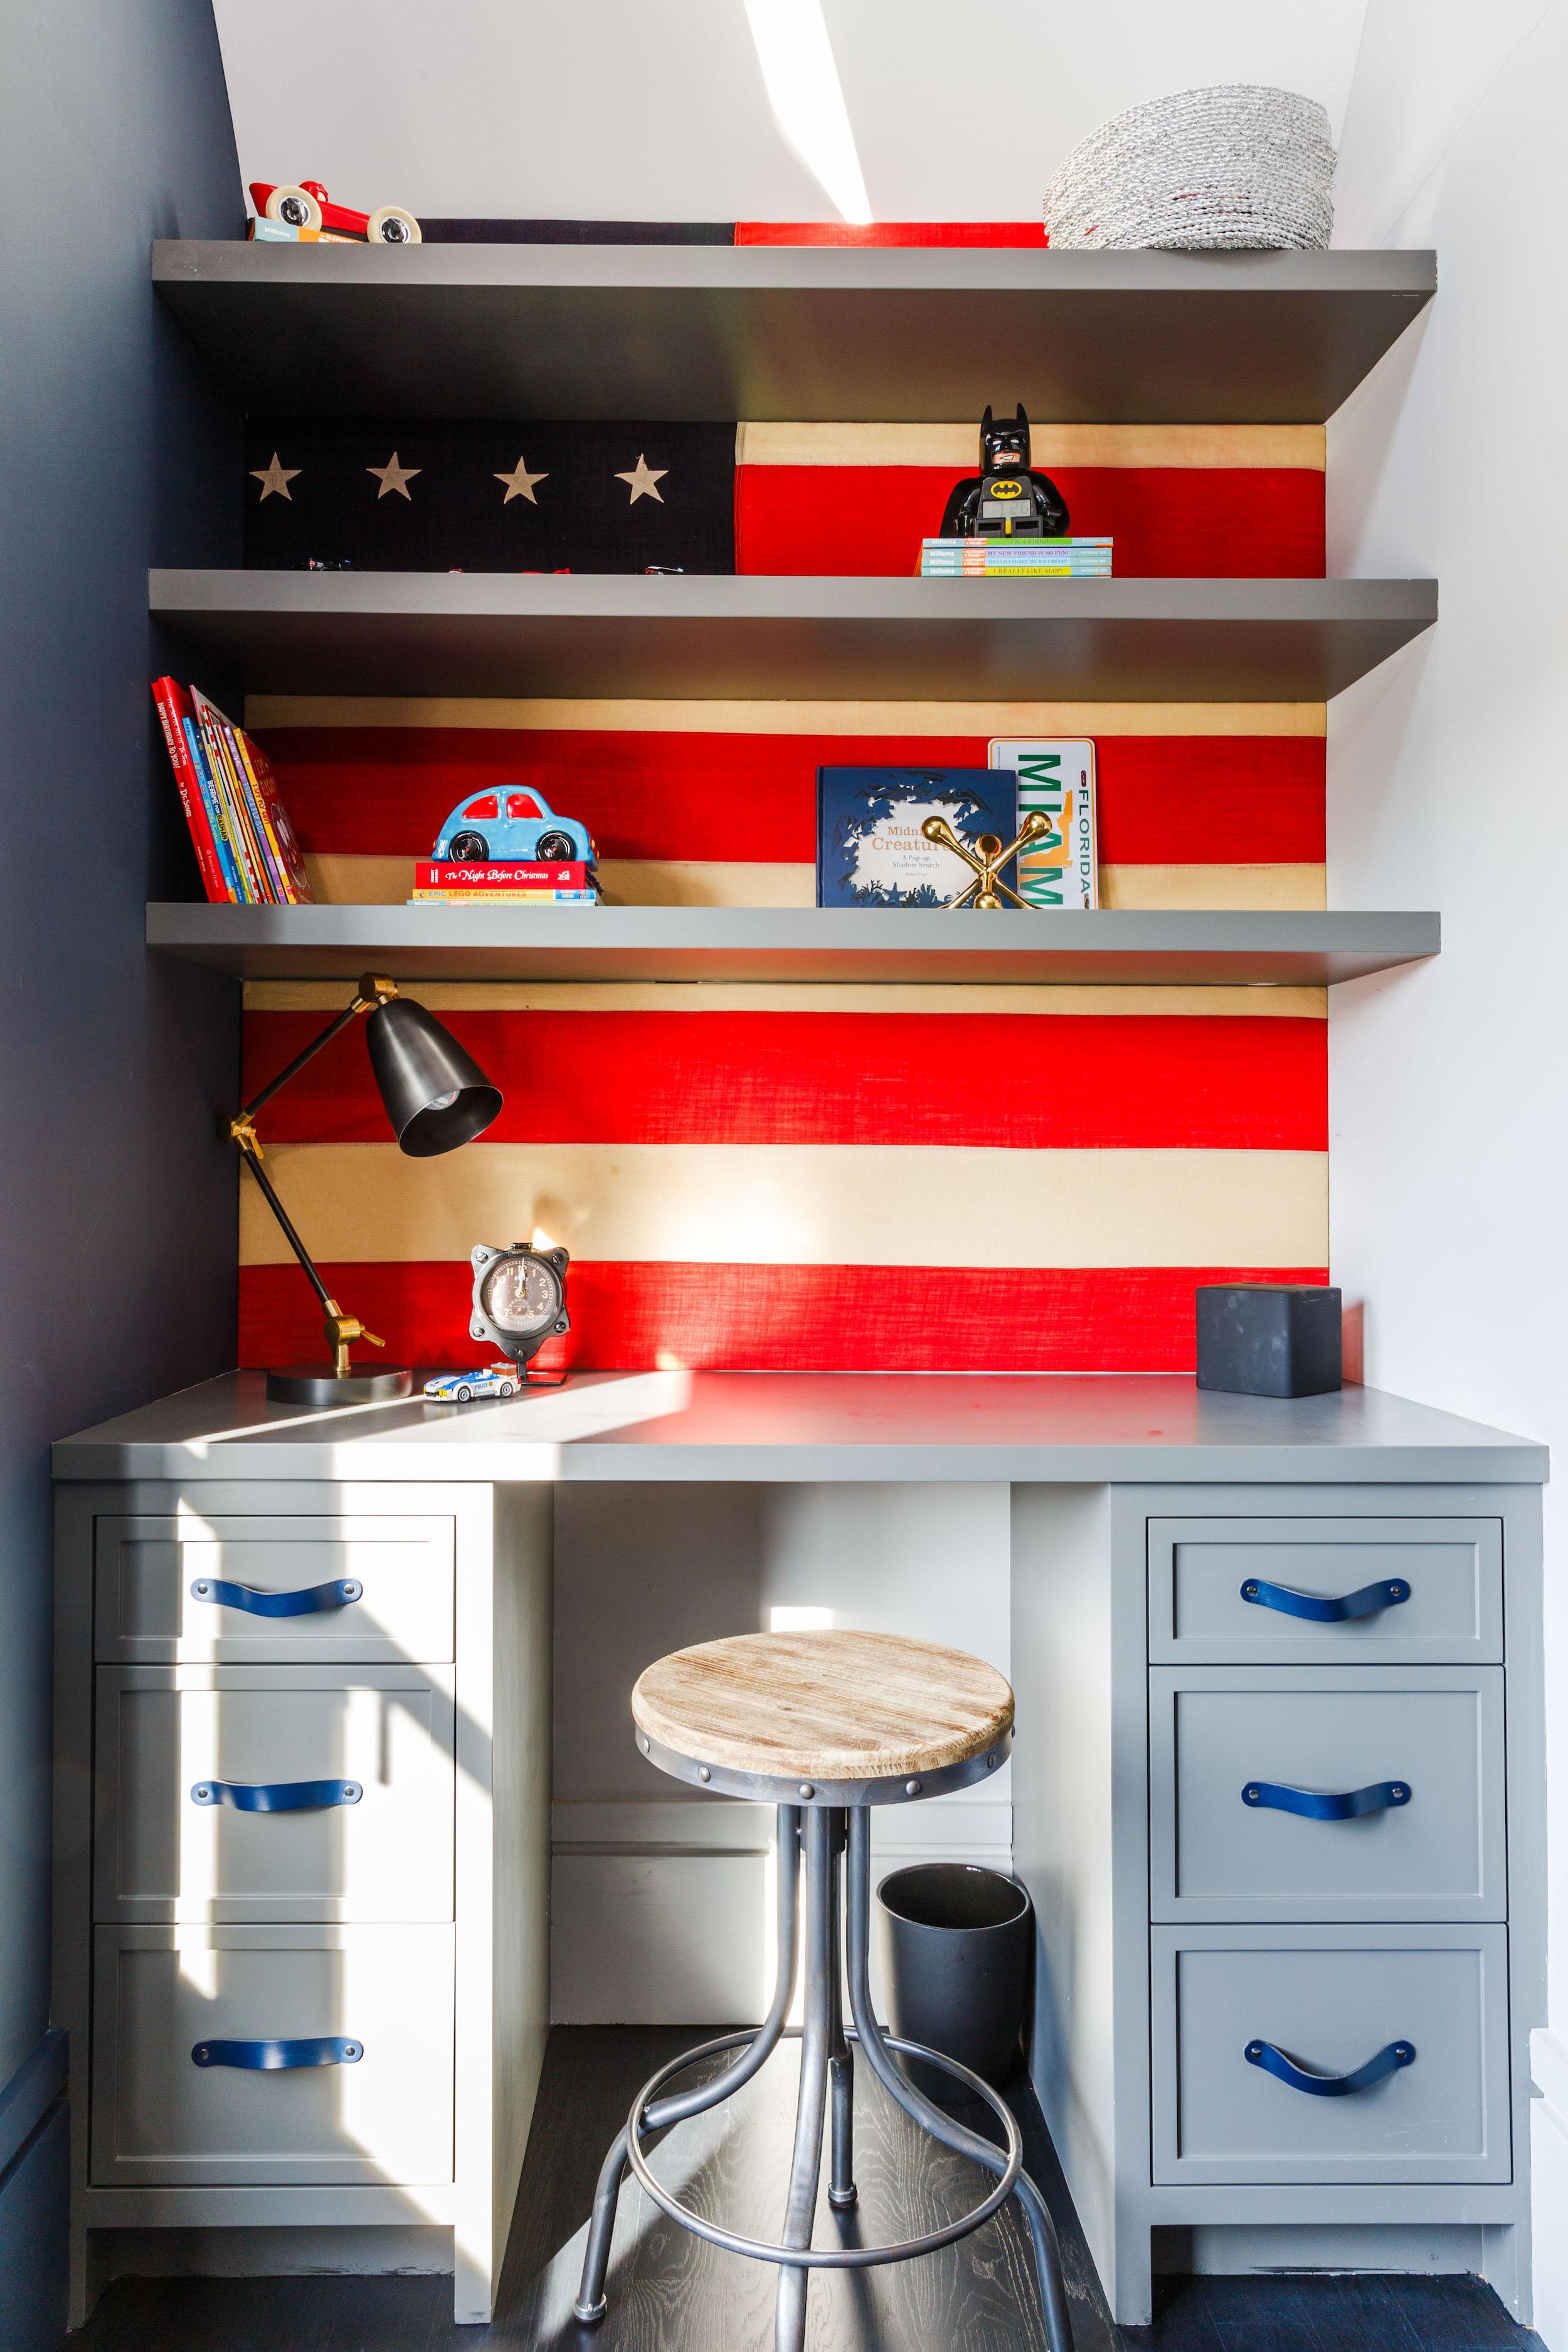 Allie Wood, Allie Wood Design Studio, Interior Designer6_D'Ambrosio_Way-4 Bedroom.jpg